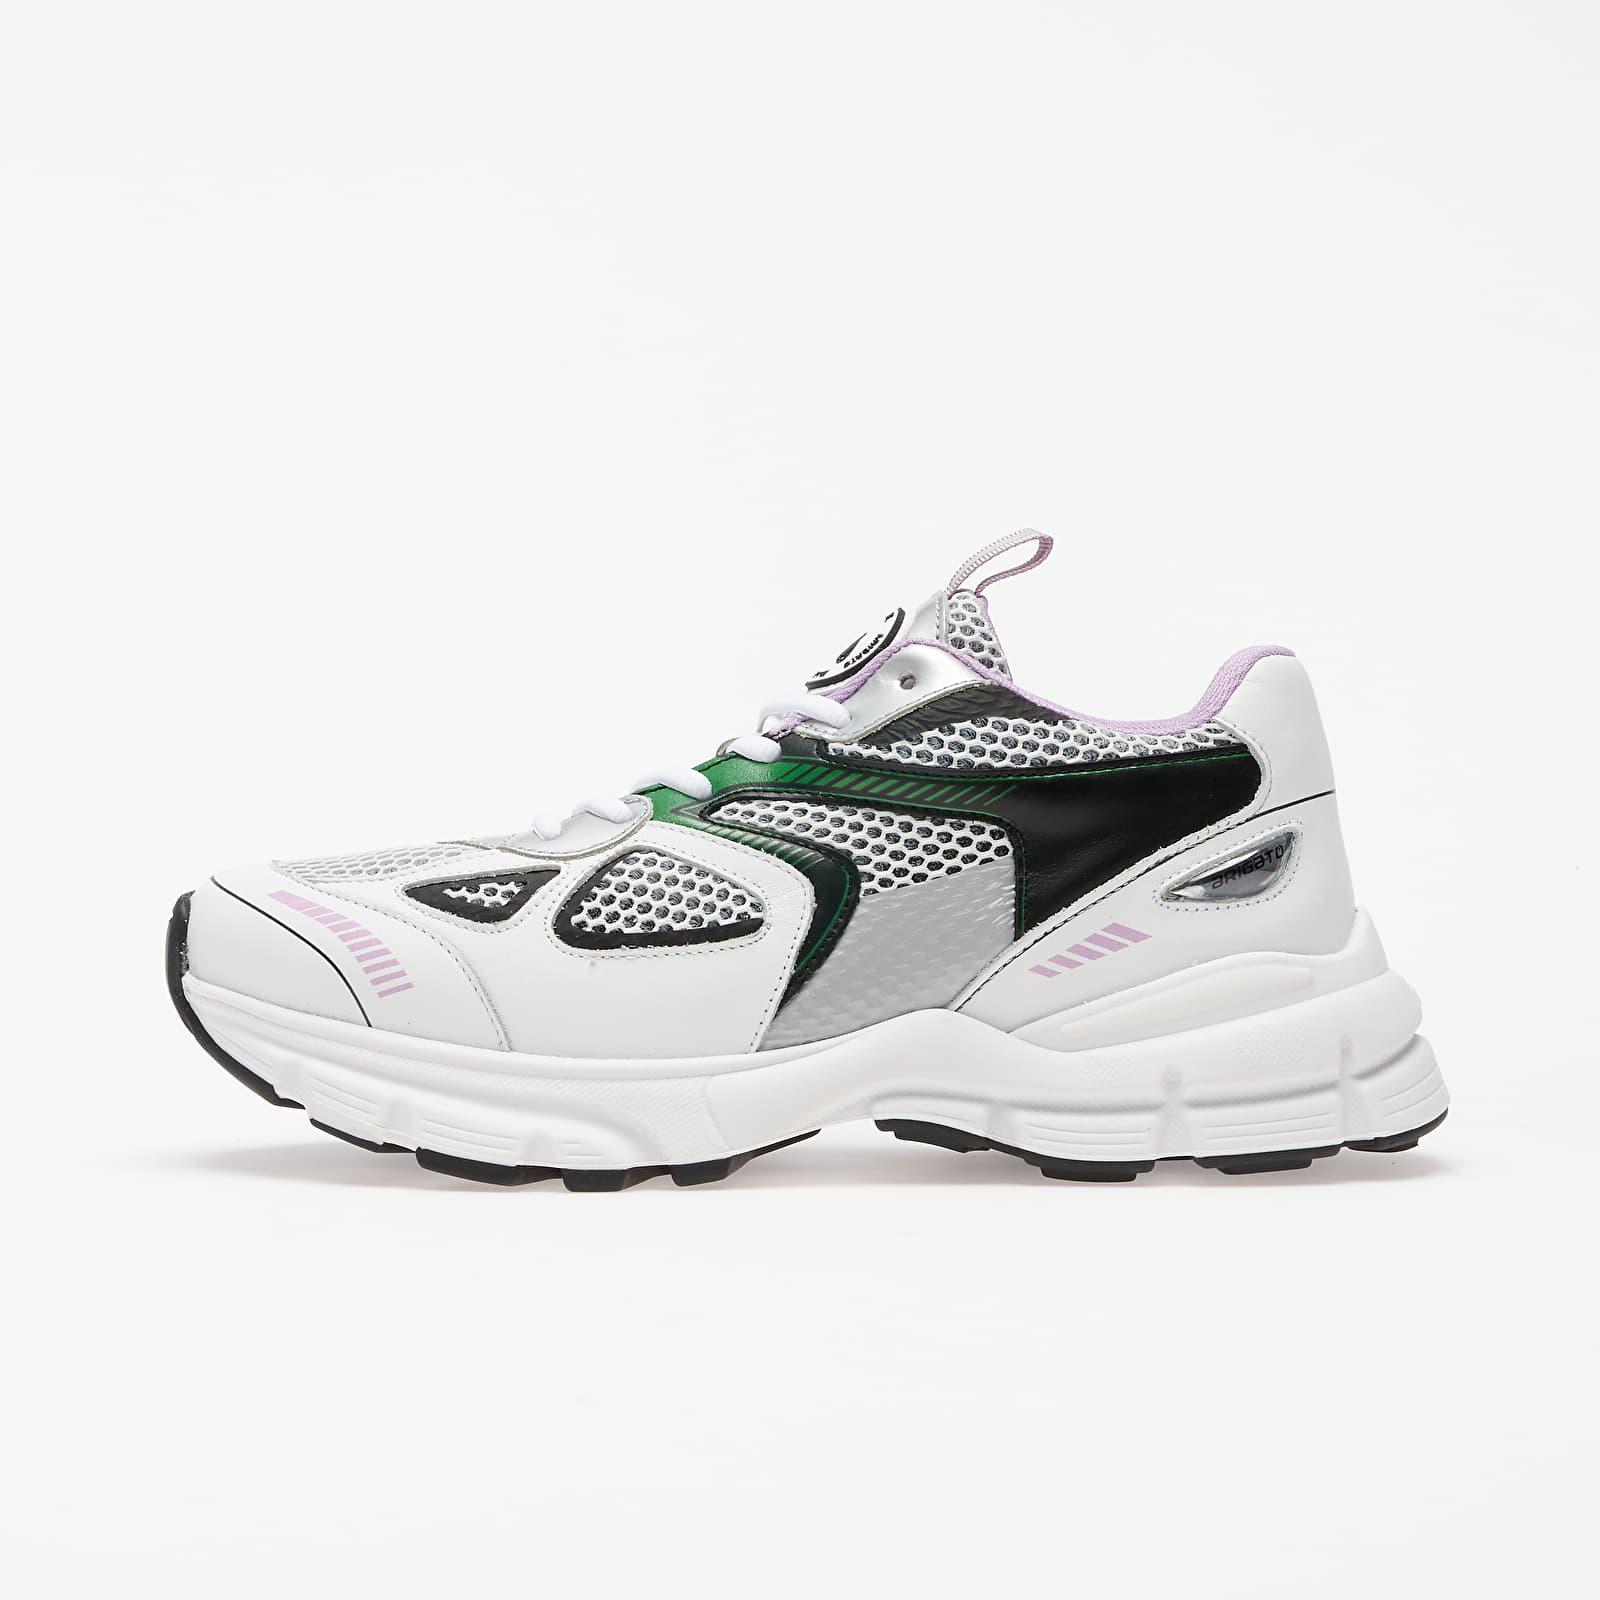 Dámské tenisky a boty Axel Arigato Marathon Runner White/ Black/ Green